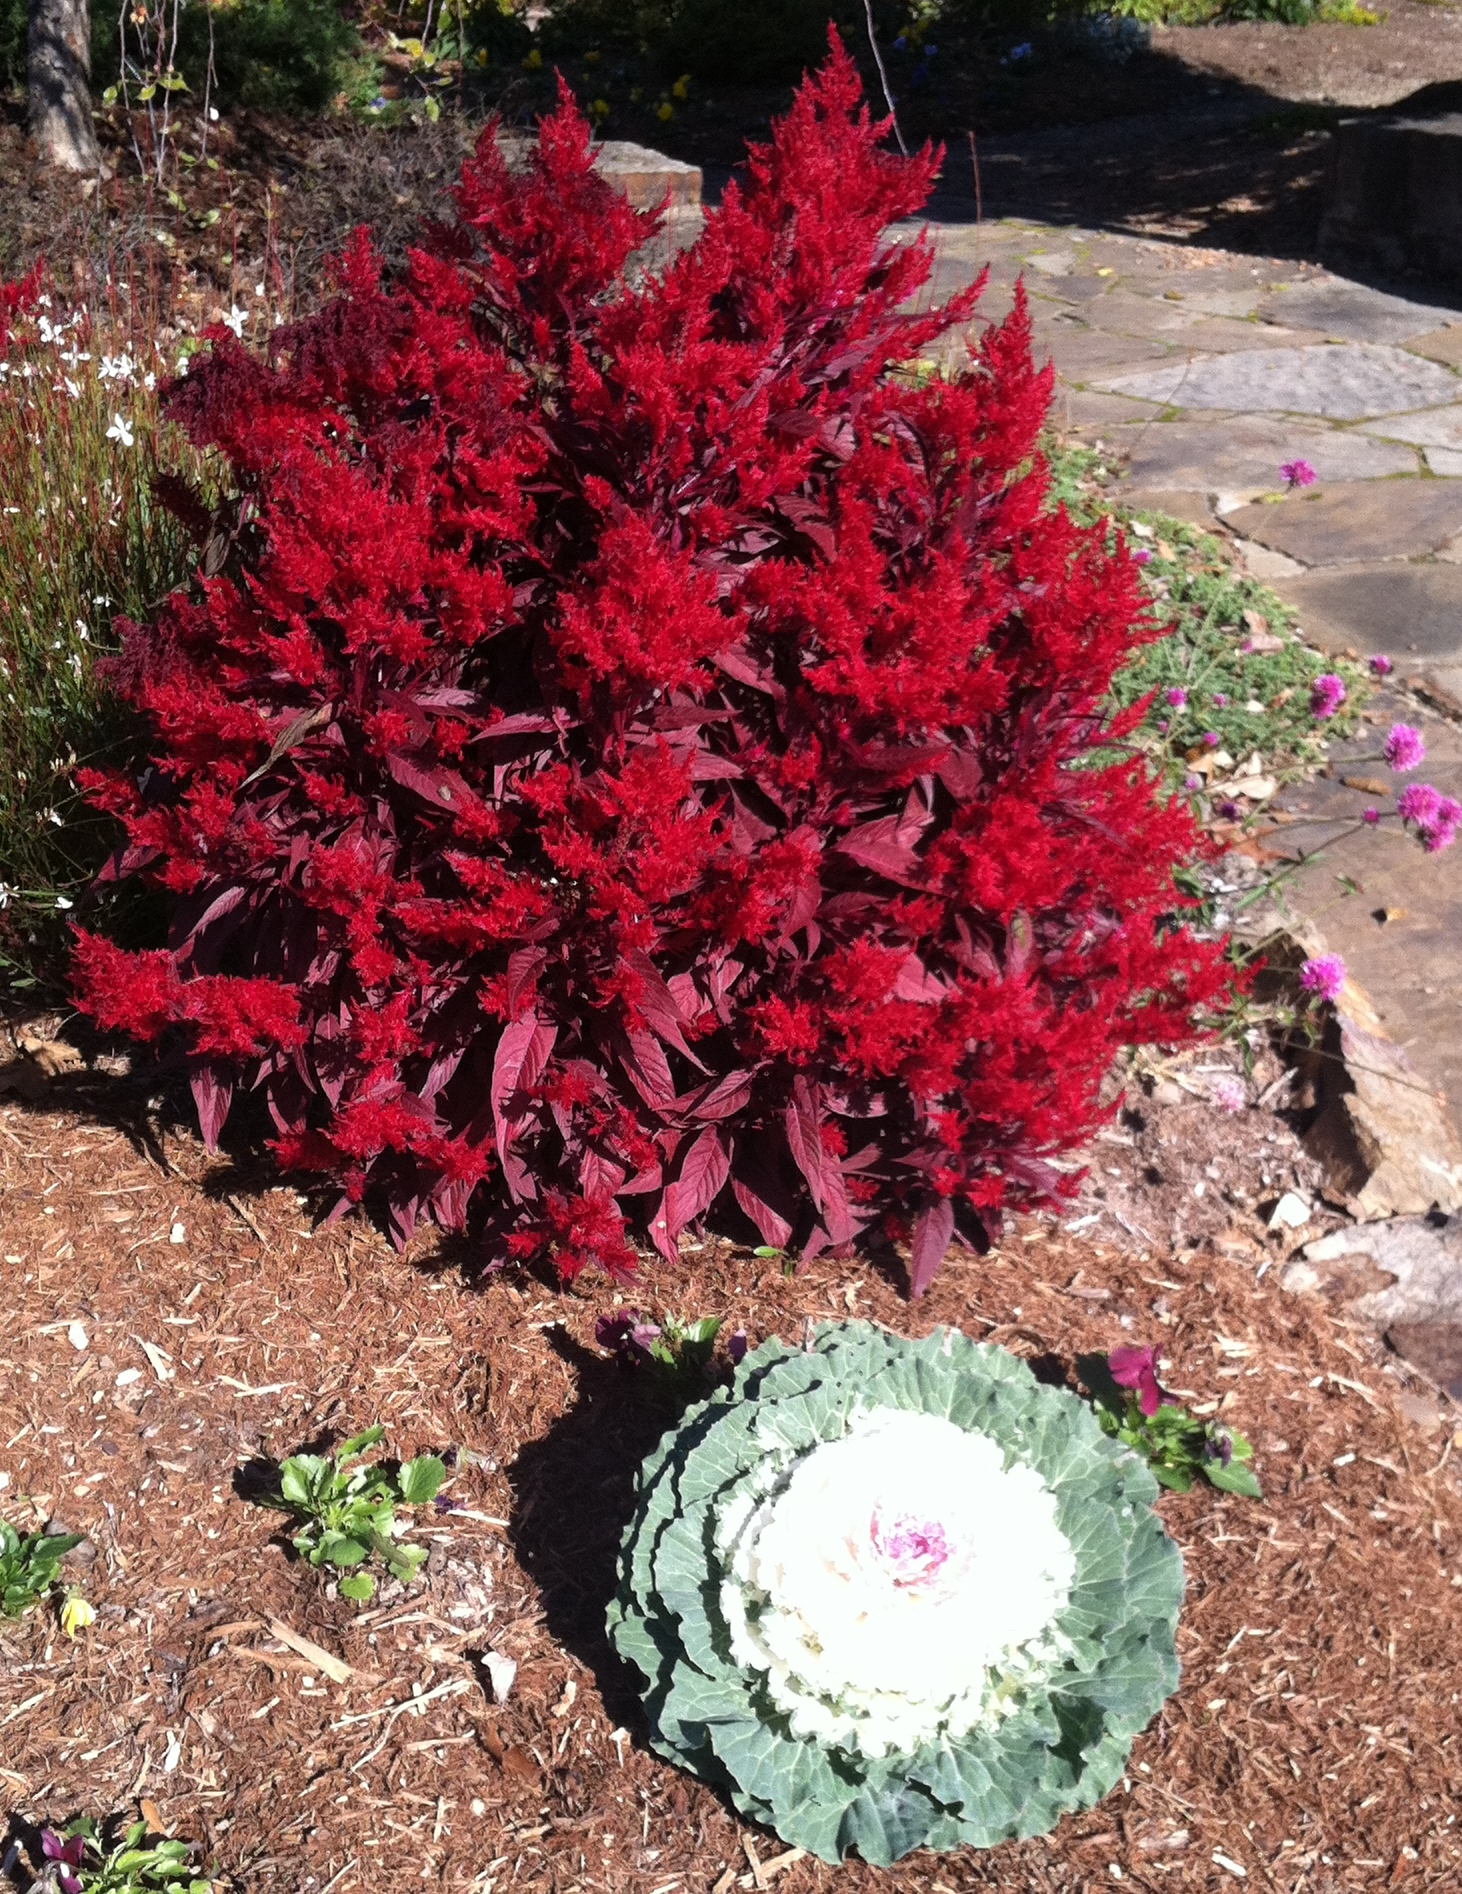 Dragon's Breath | Botanical Garden of the Ozarks